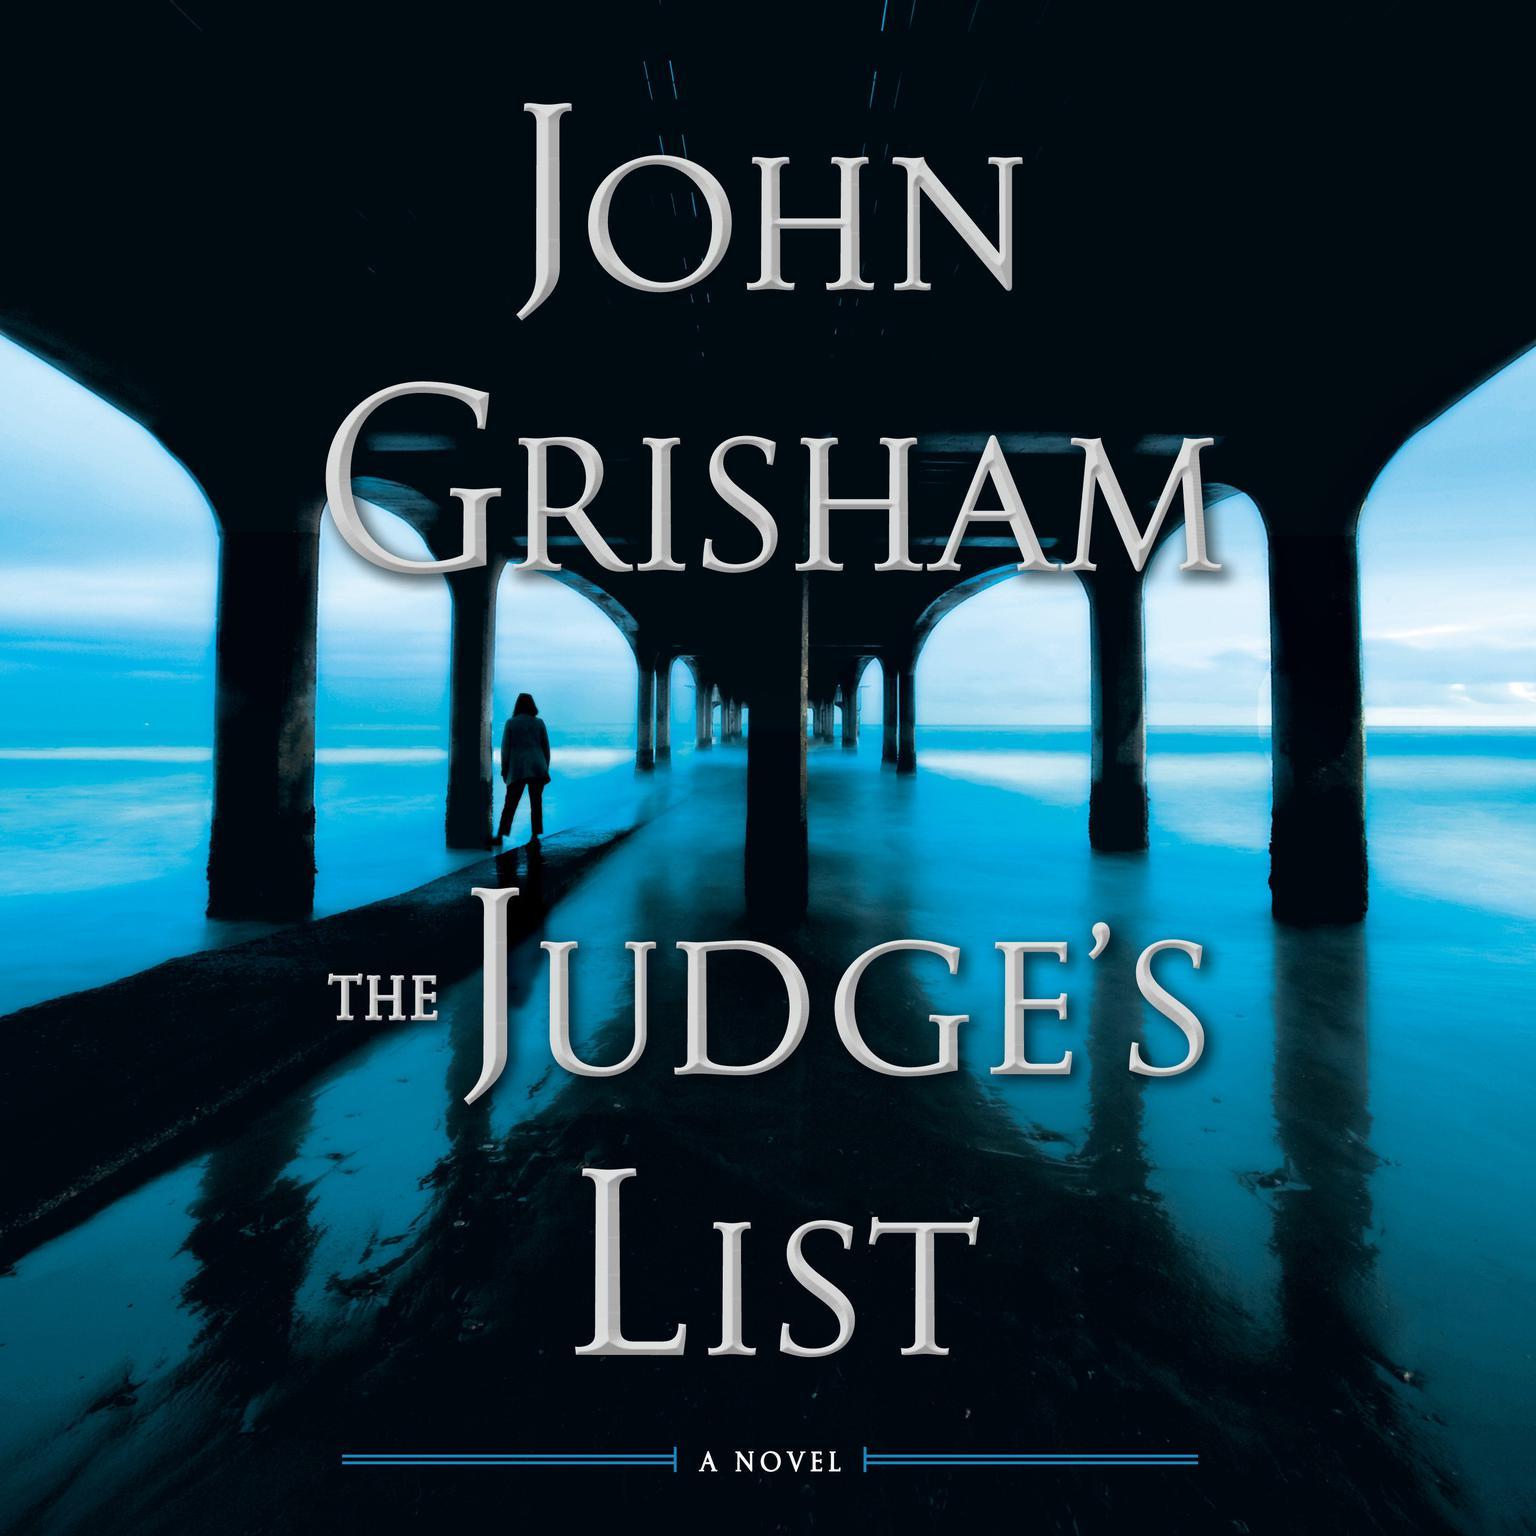 The Judges List: A Novel Audiobook, by John Grisham